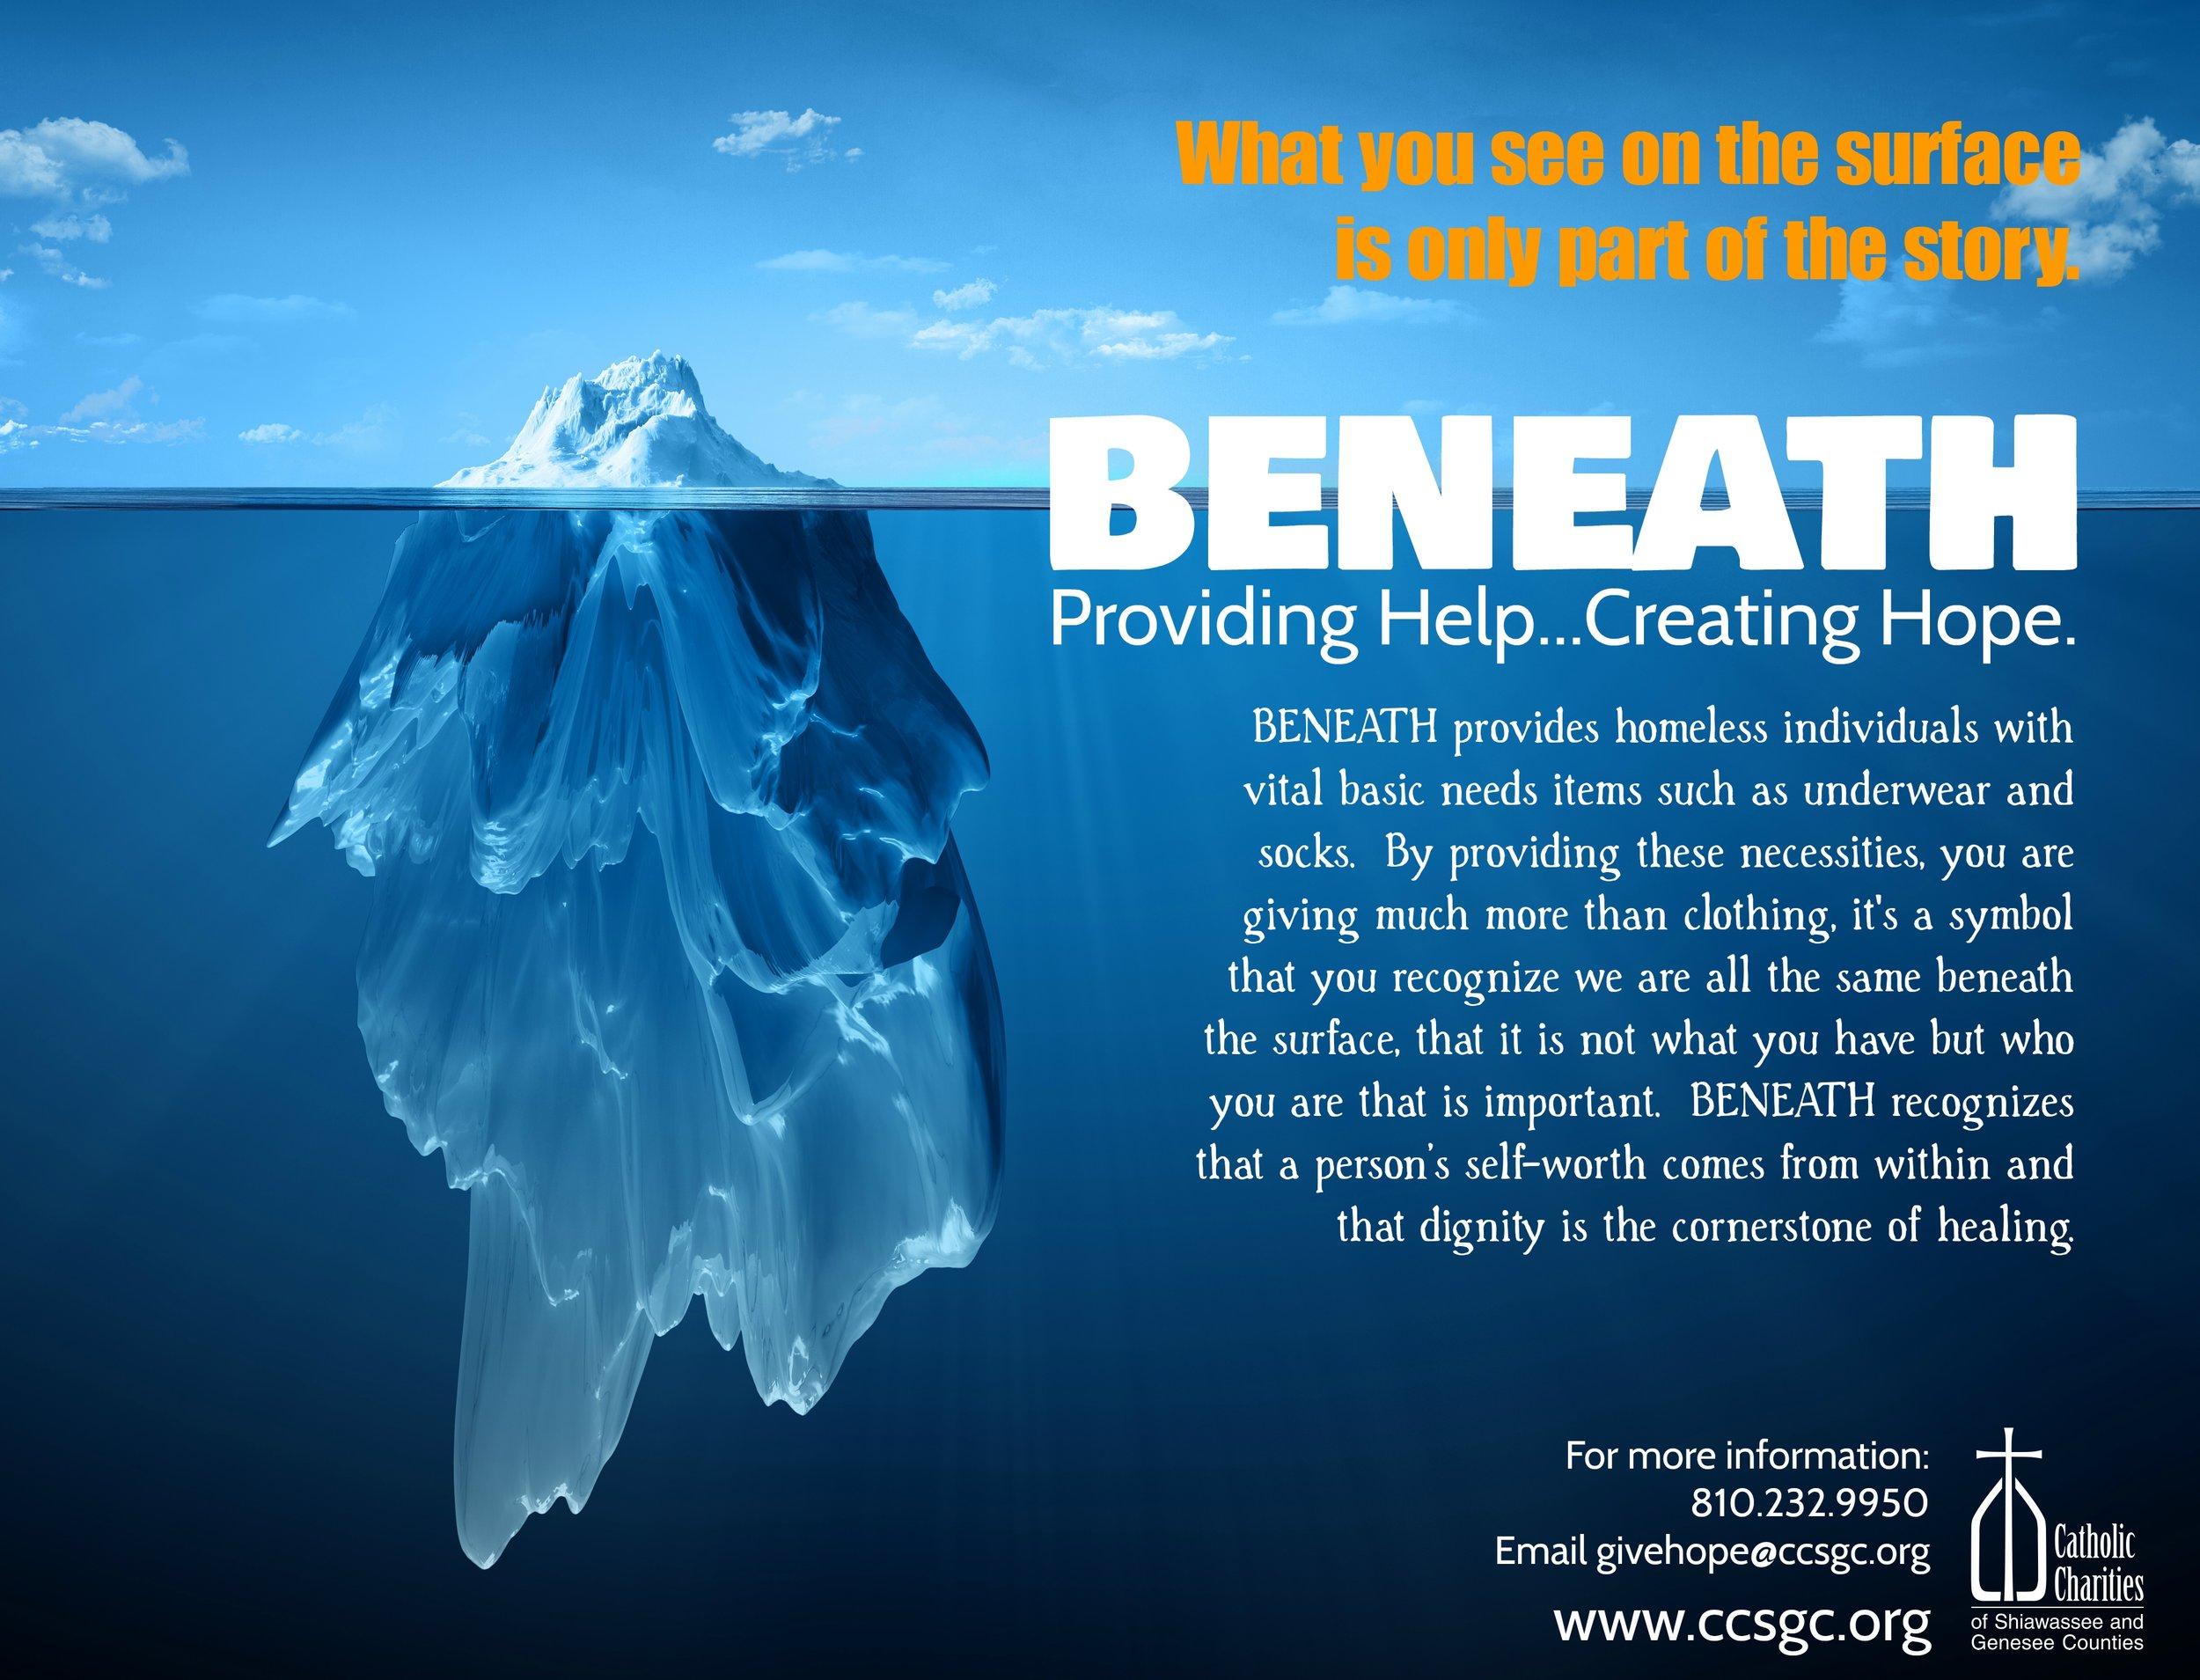 BENEATH4.jpg